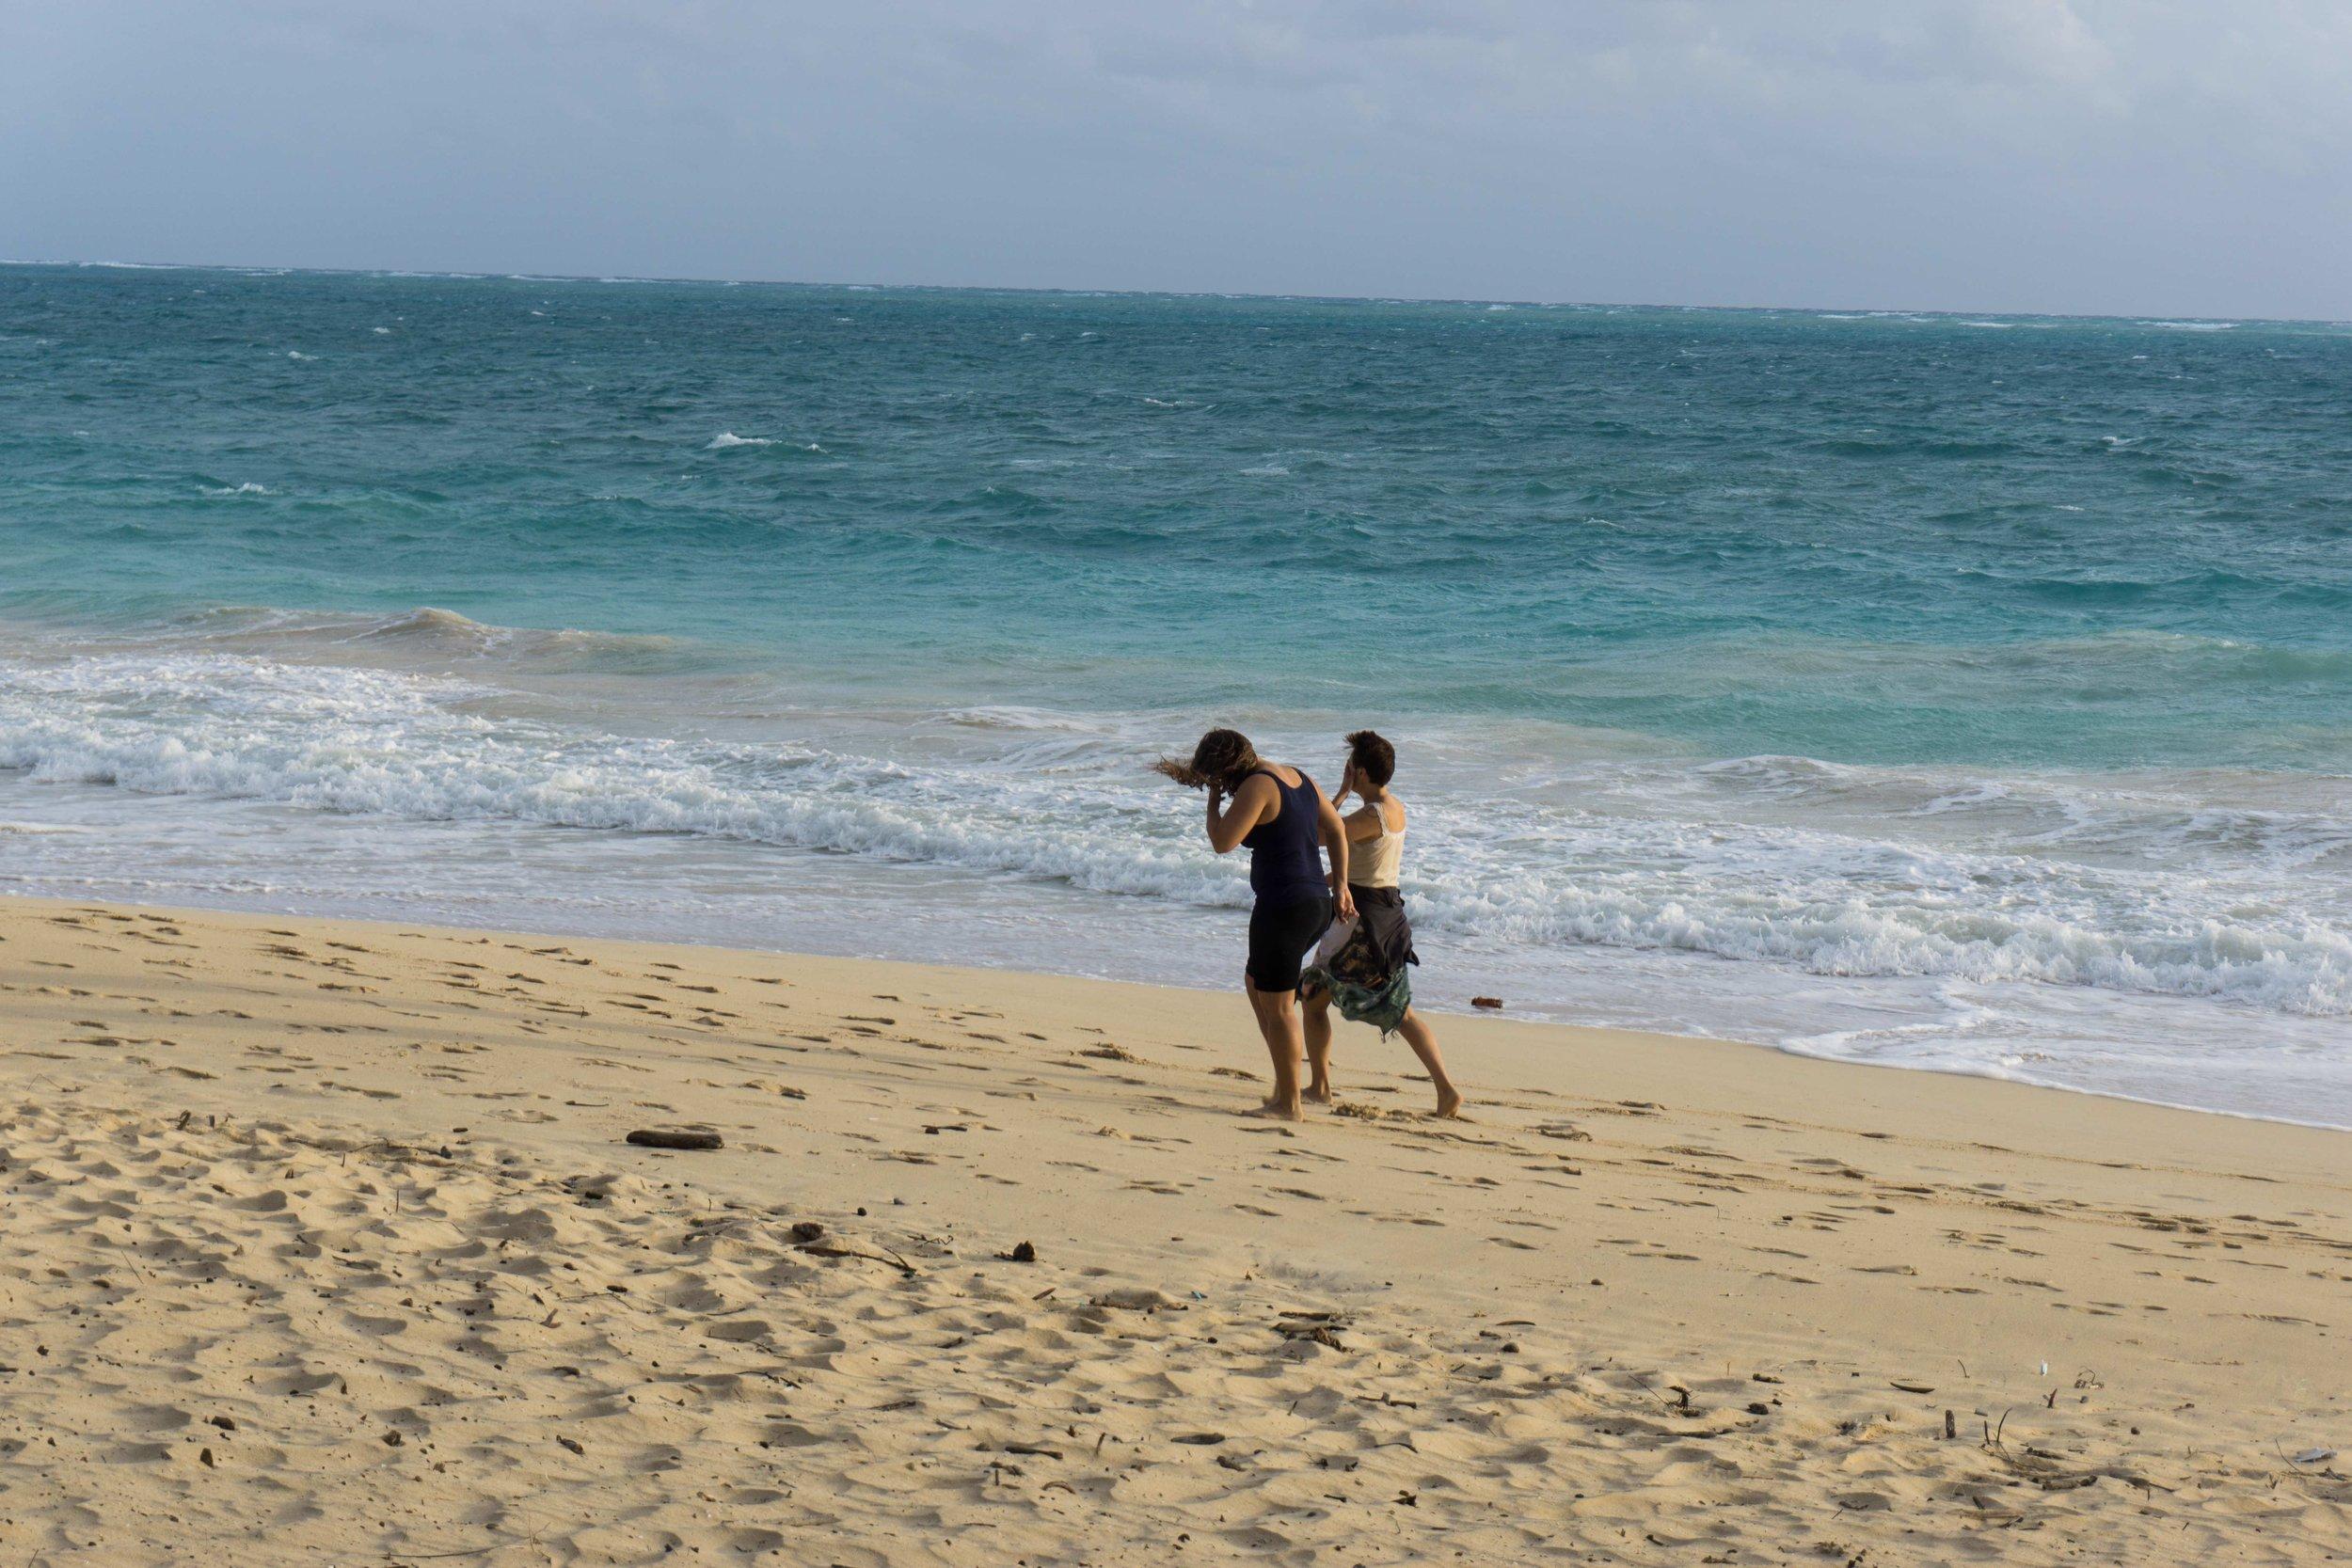 Girls on beach DSC03679.jpg